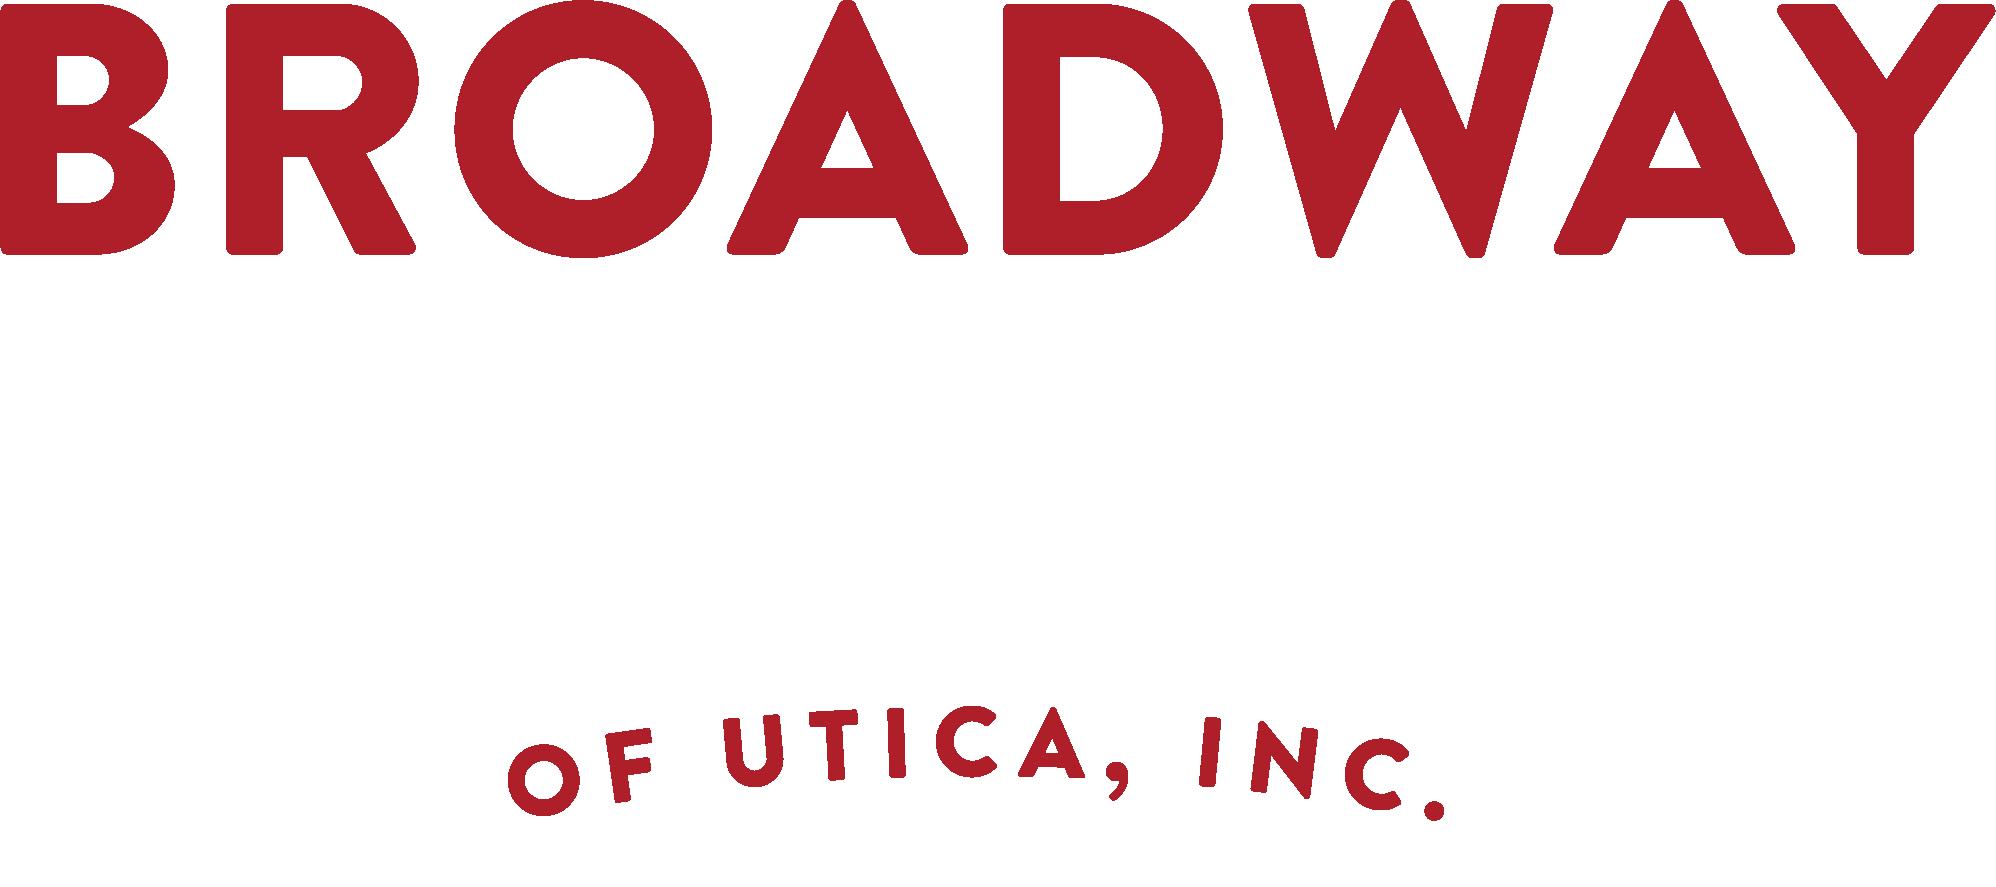 Broadway Theater League of Utica